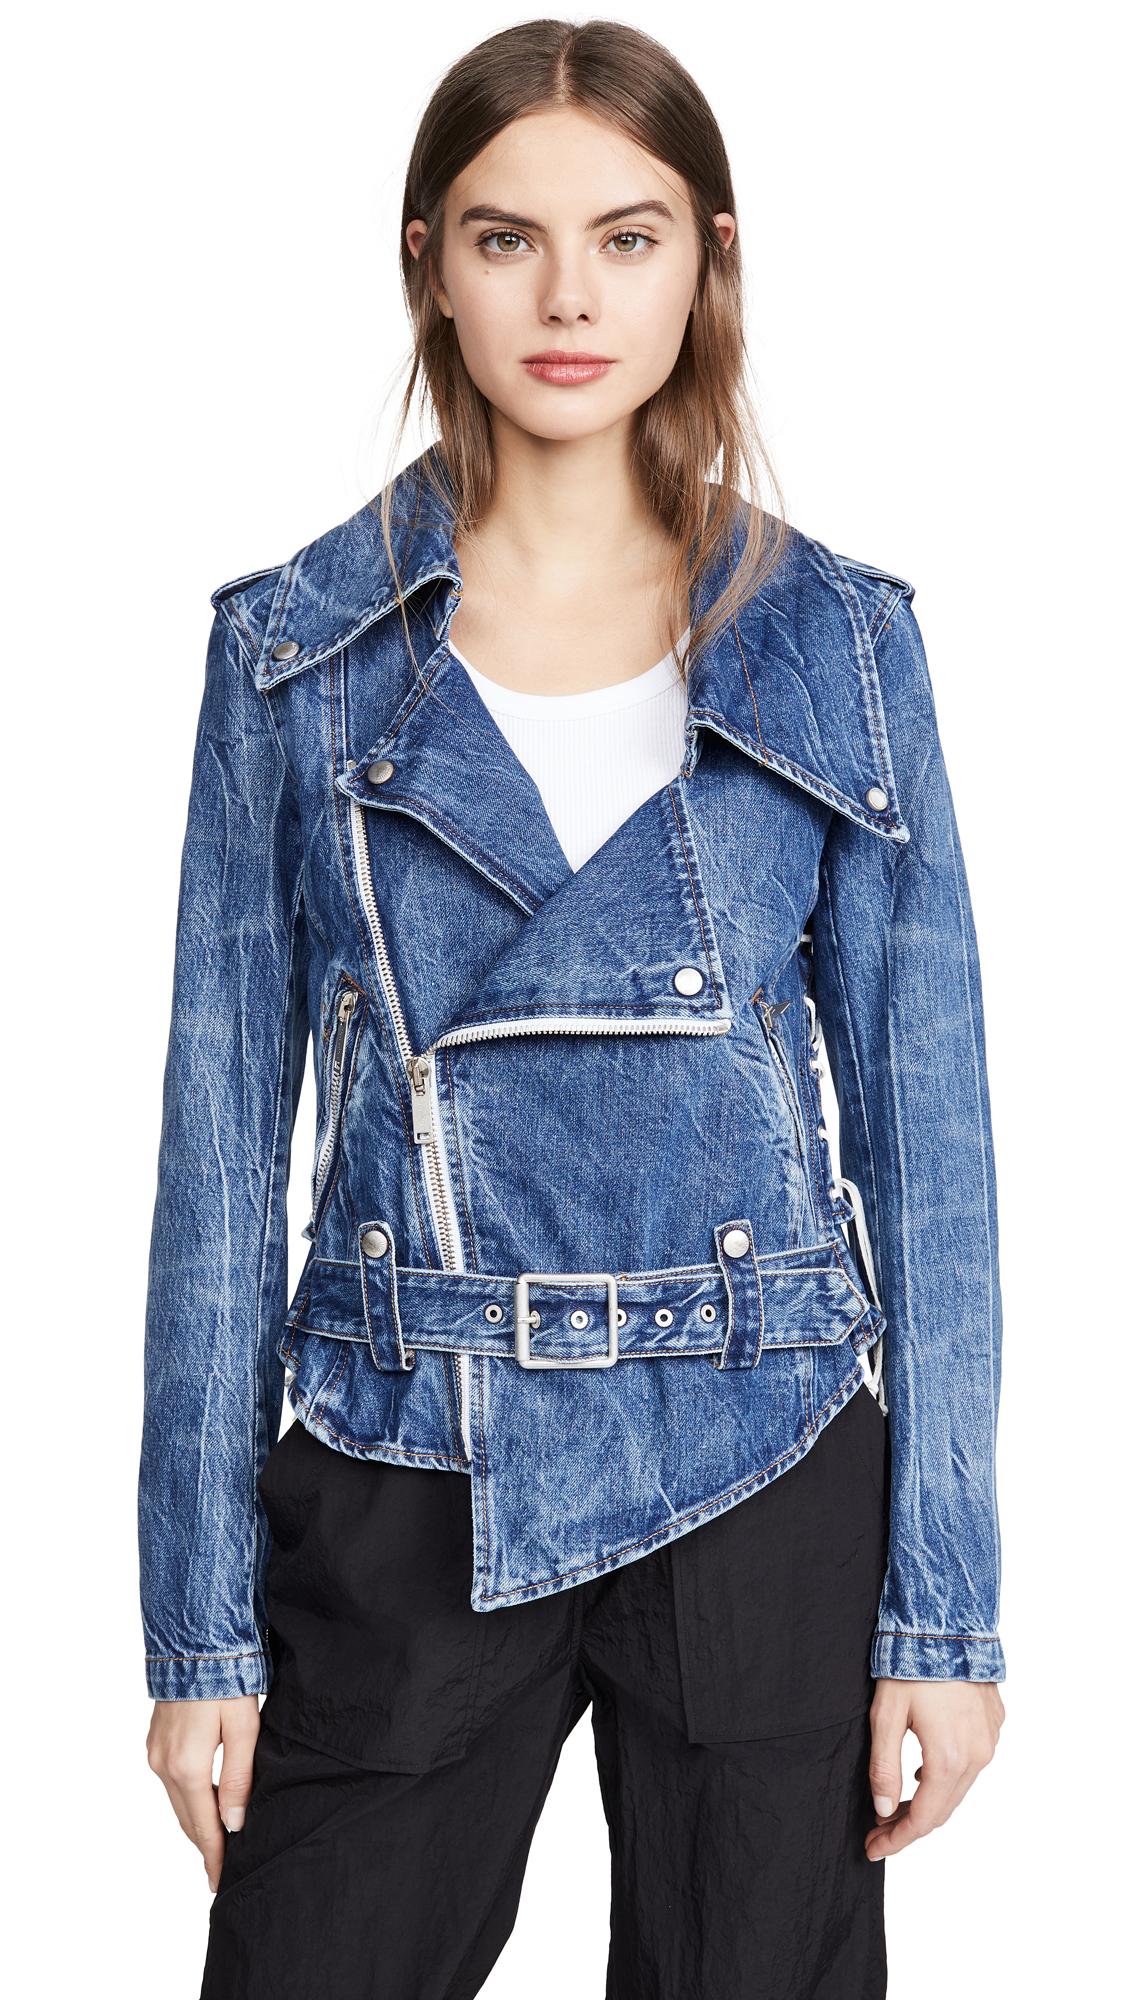 Buy Unravel Project Vinta Chaos Denim Jacket online beautiful Unravel Project Jackets, Coats, Coats